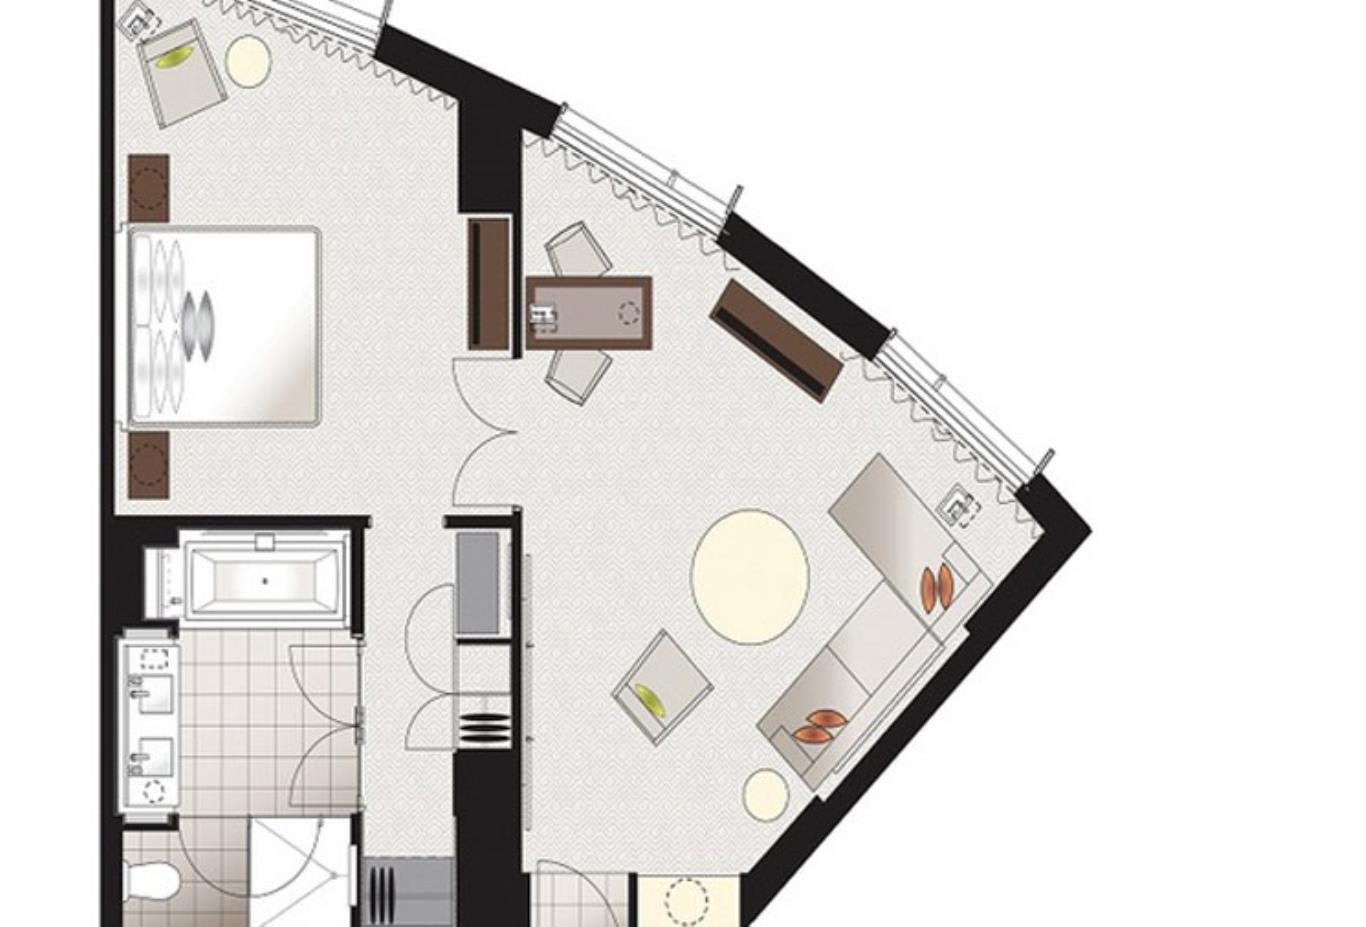 Executive Suite Floorplan